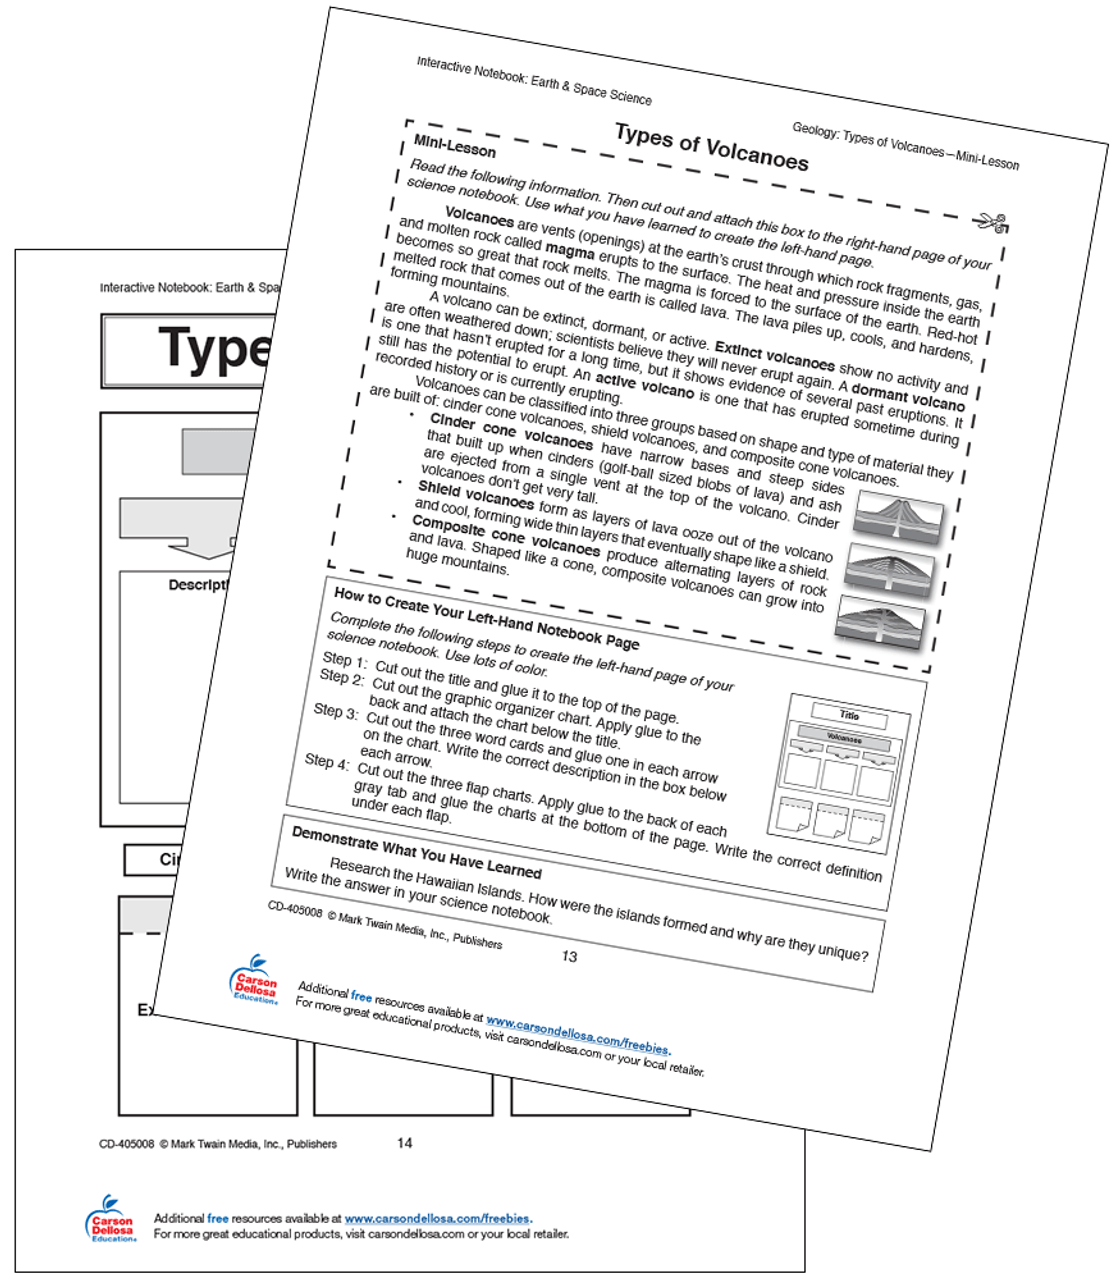 medium resolution of Volcano Types Free Printable   Carson Dellosa